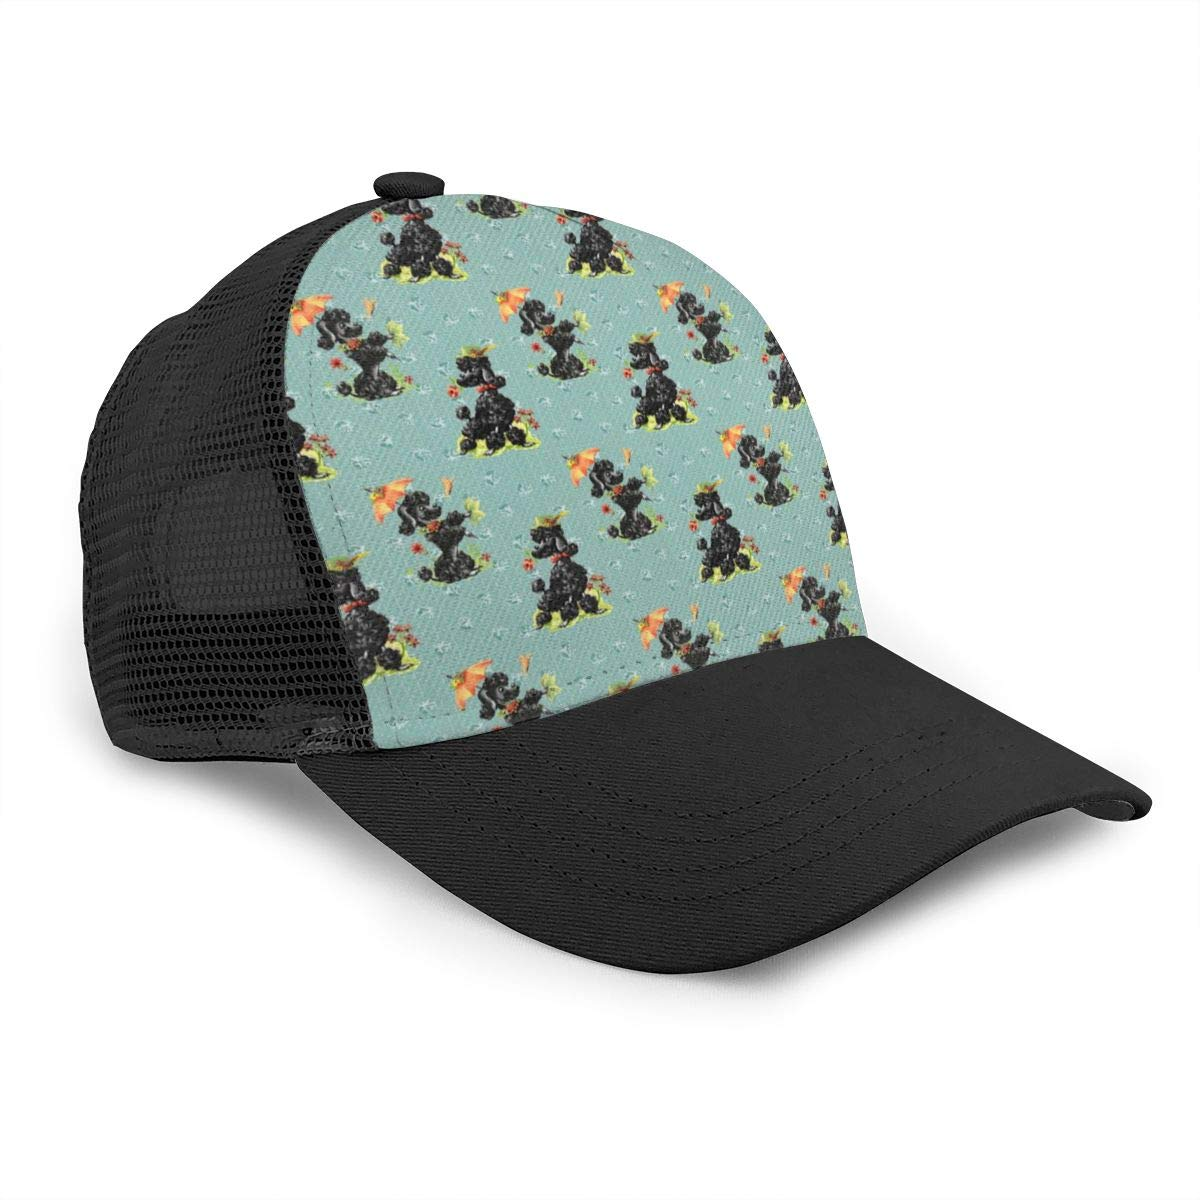 Mens Prissy Poodles Green Flat Baseball Hat Vintage Sports Cap for Unisex